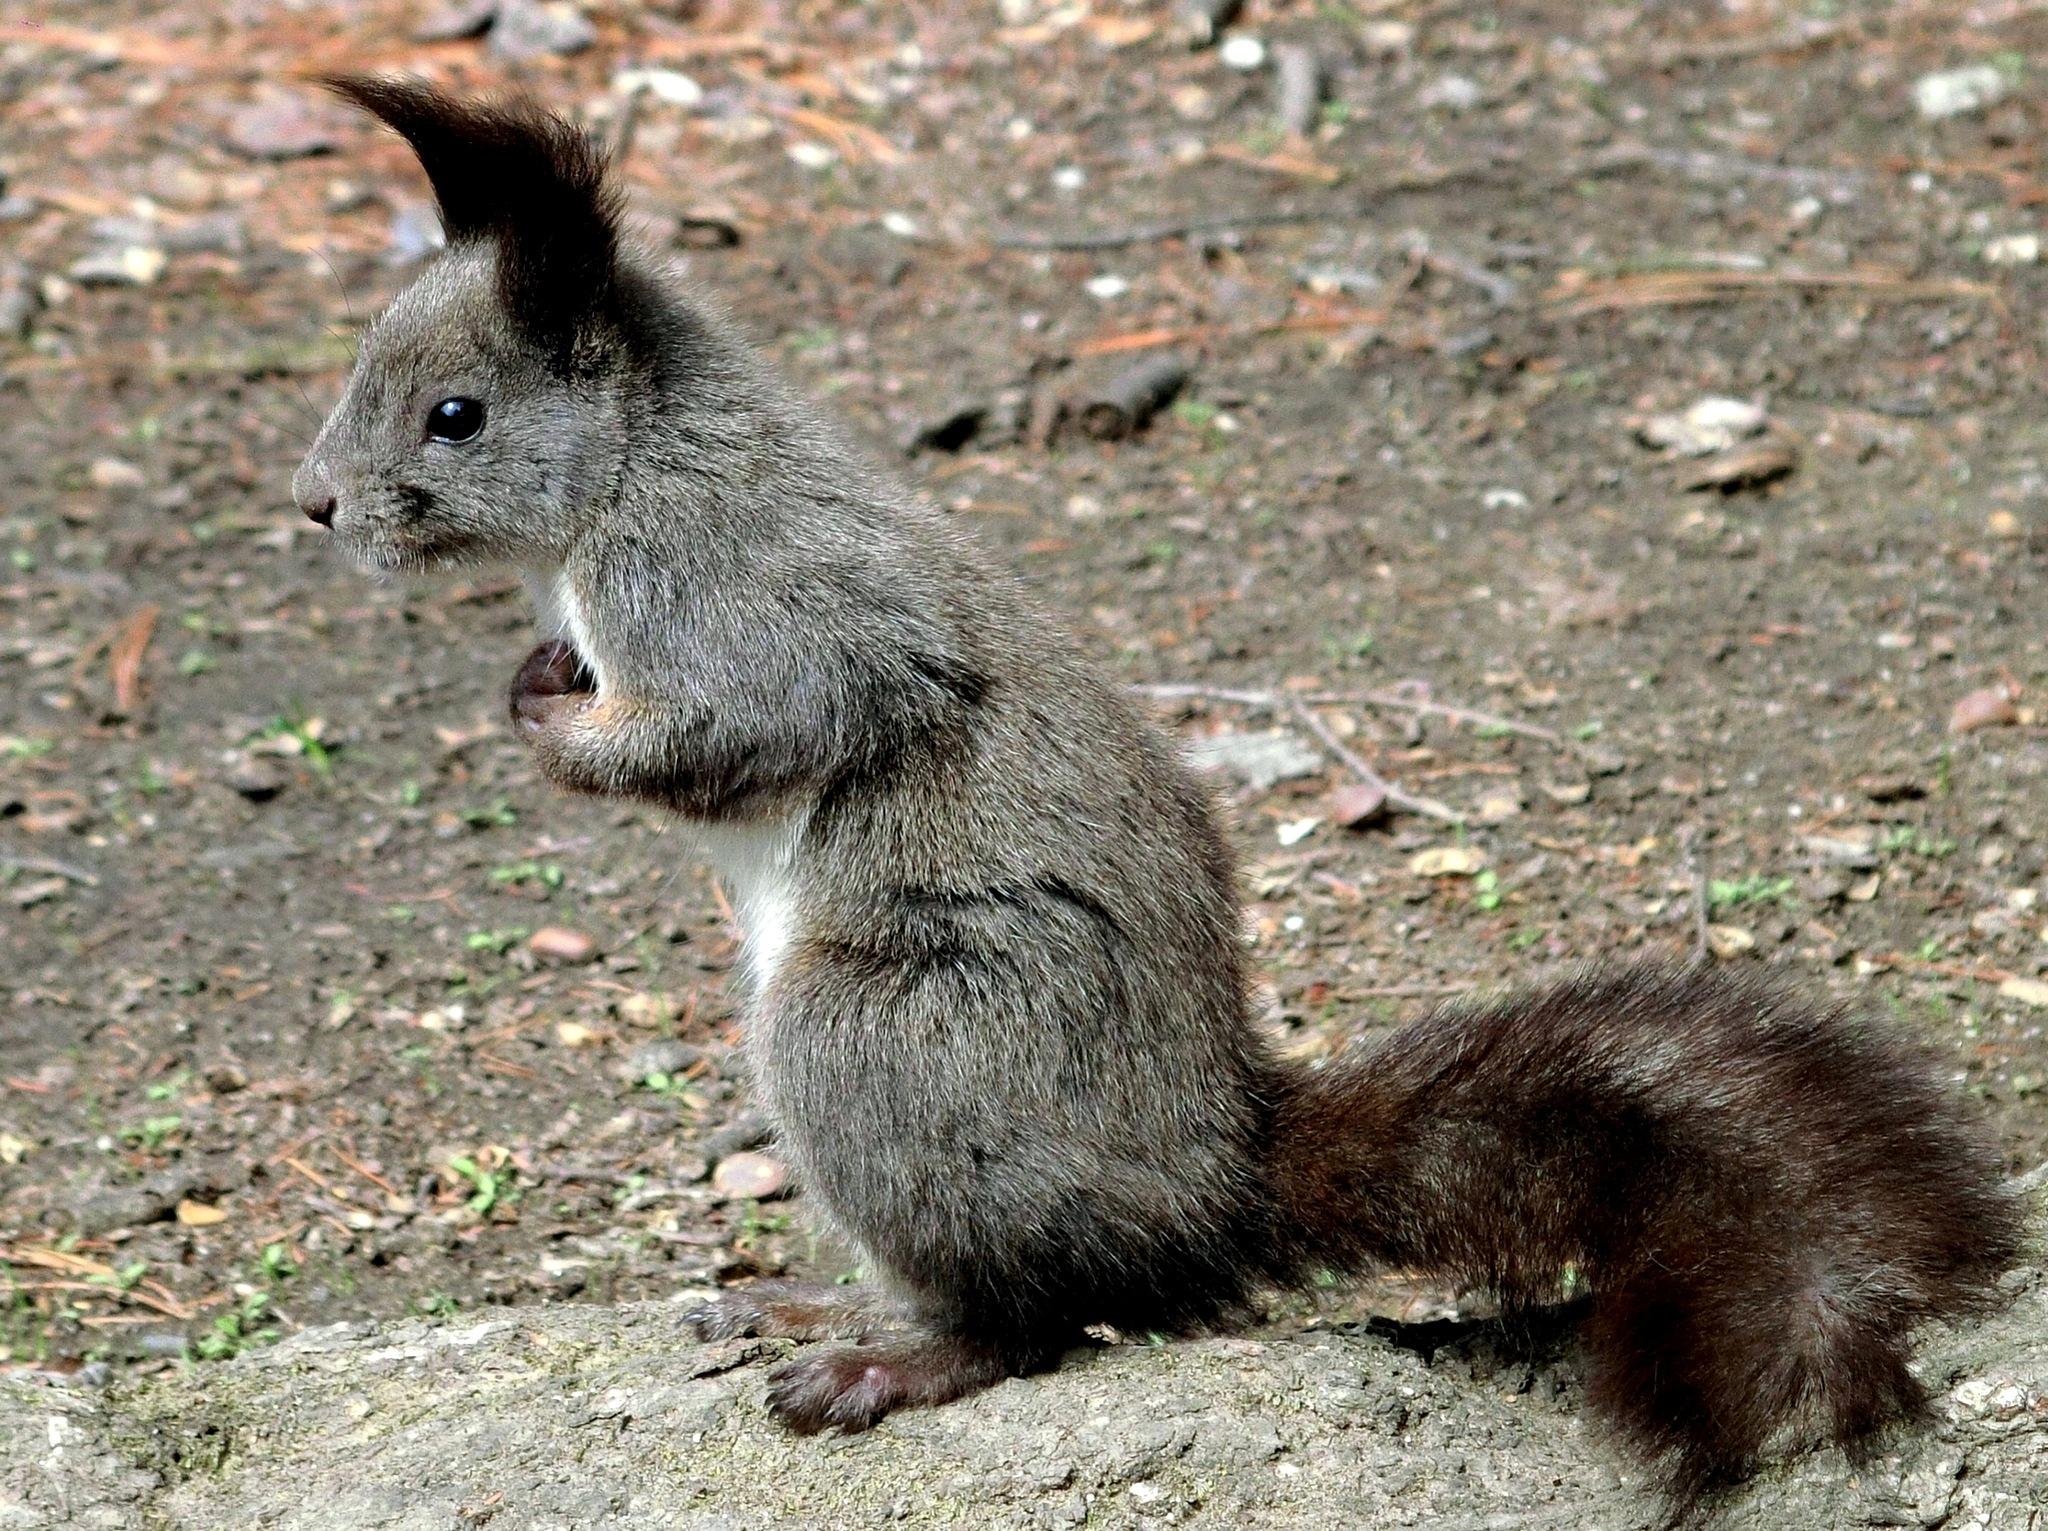 Squirrel-2 by pop88123